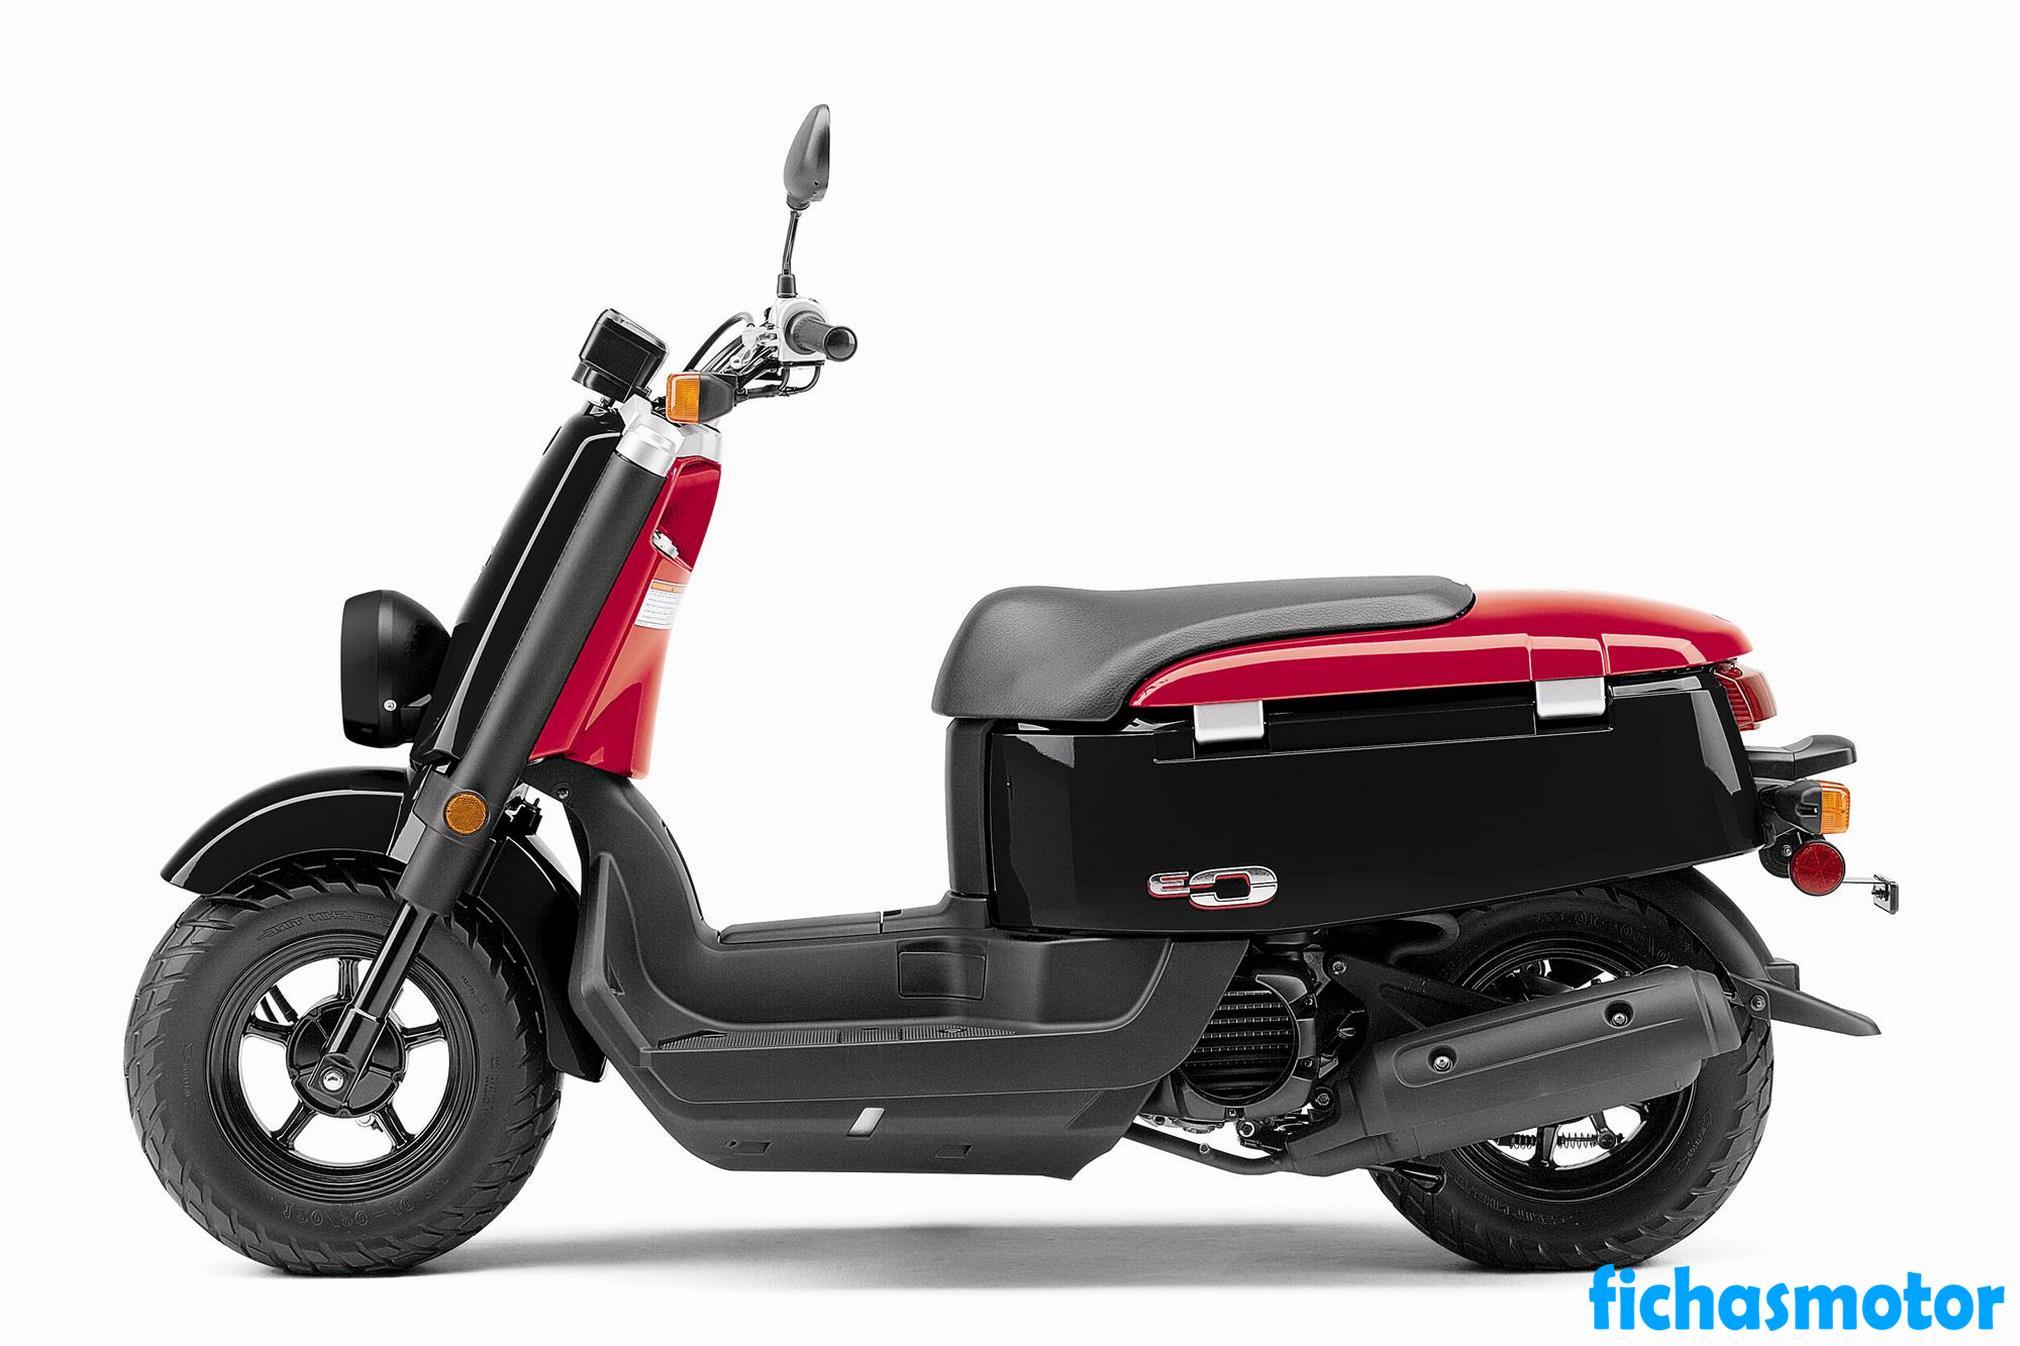 Ficha técnica Yamaha c3 2013